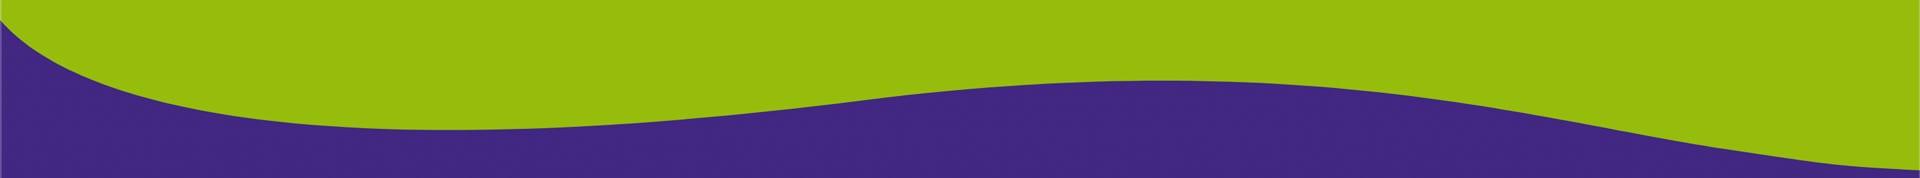 curve green purple